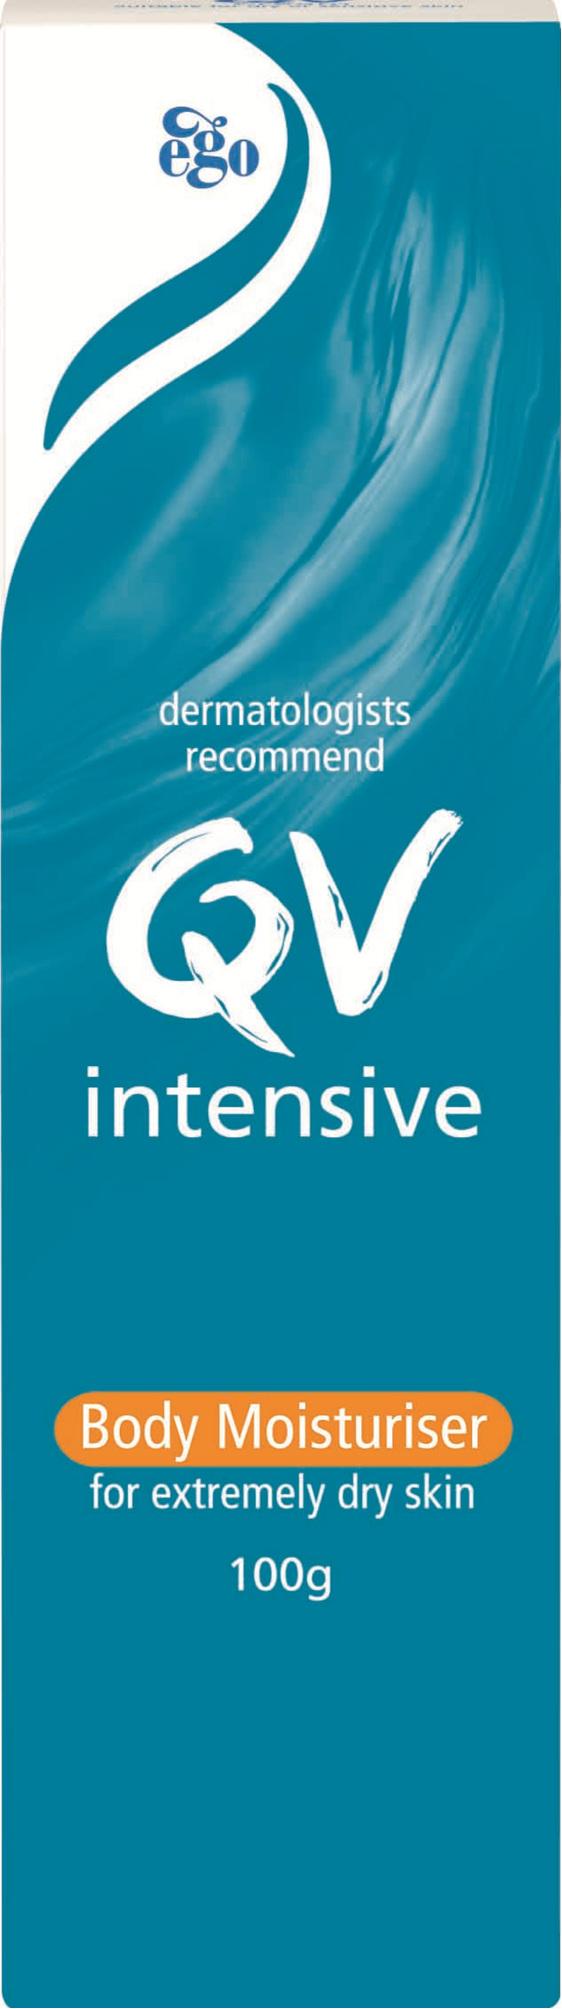 EGO Qv Intensive Cream 100G